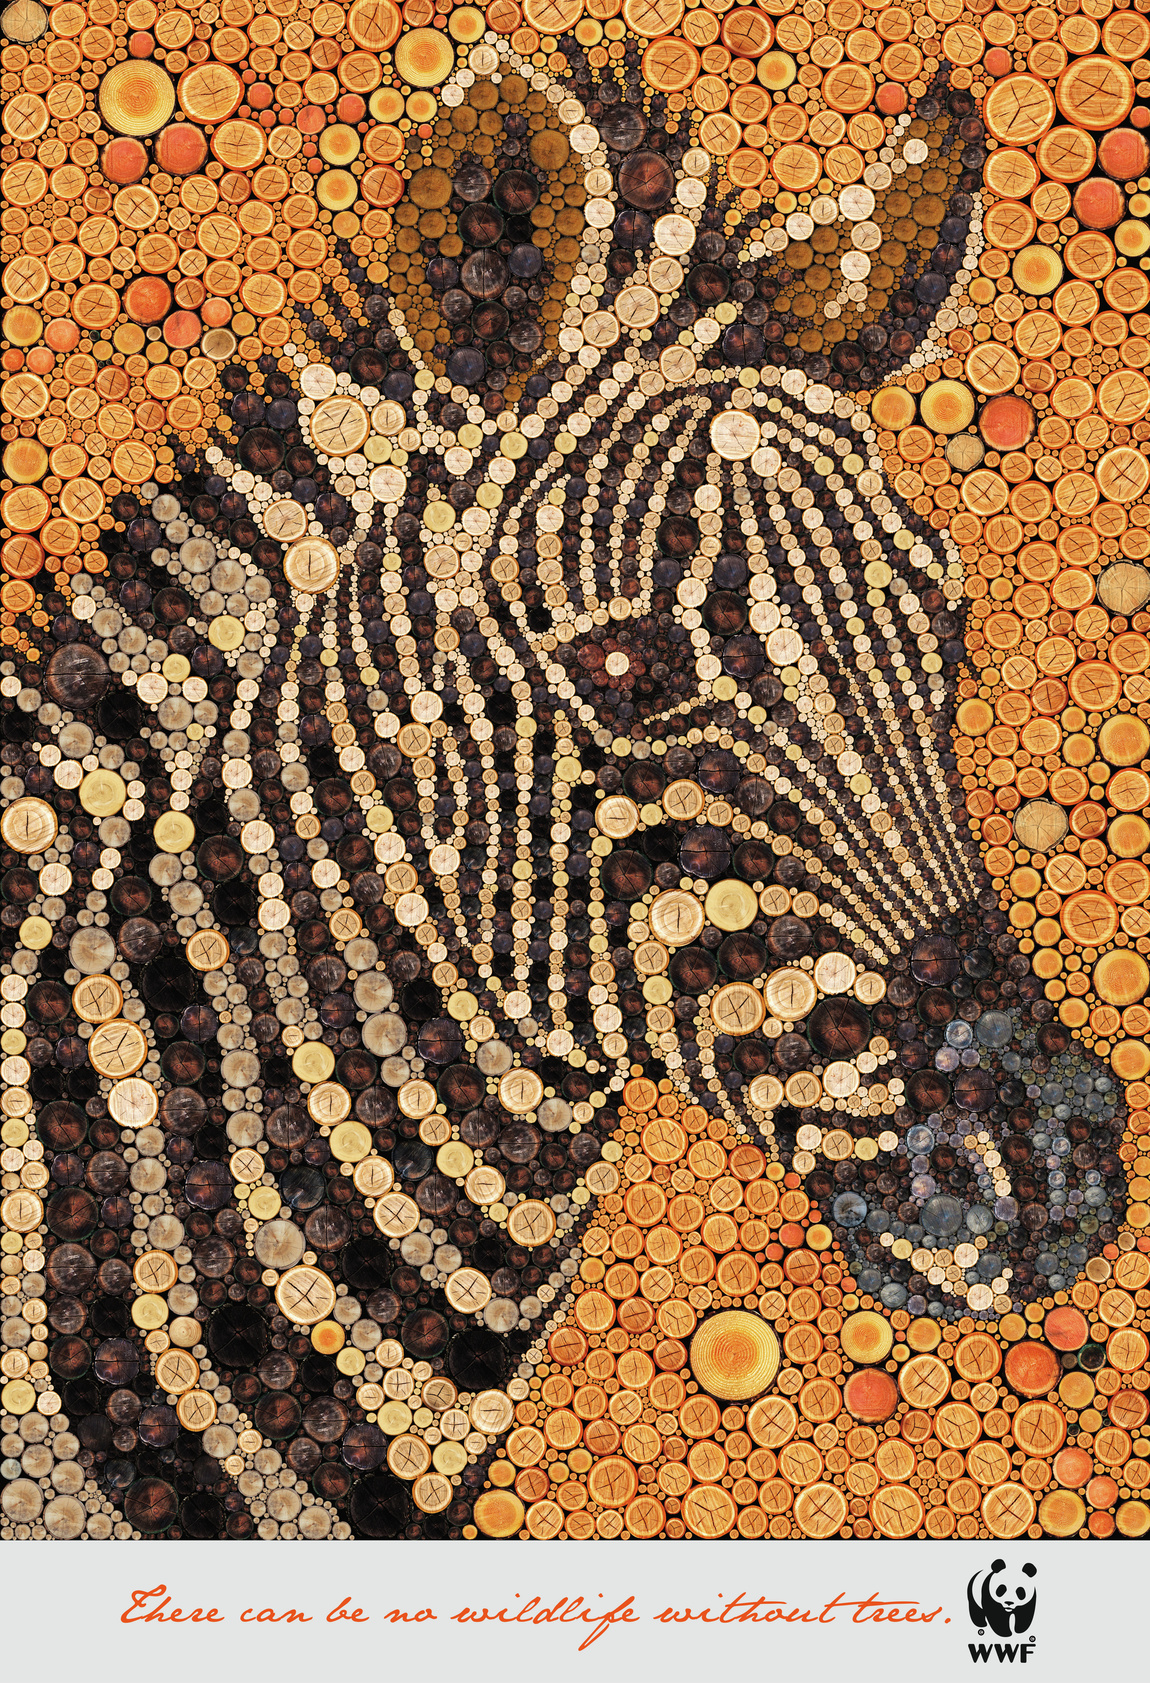 wwf-wwf-zebra-giraffe-bird-tiger-print-384957-adeevee